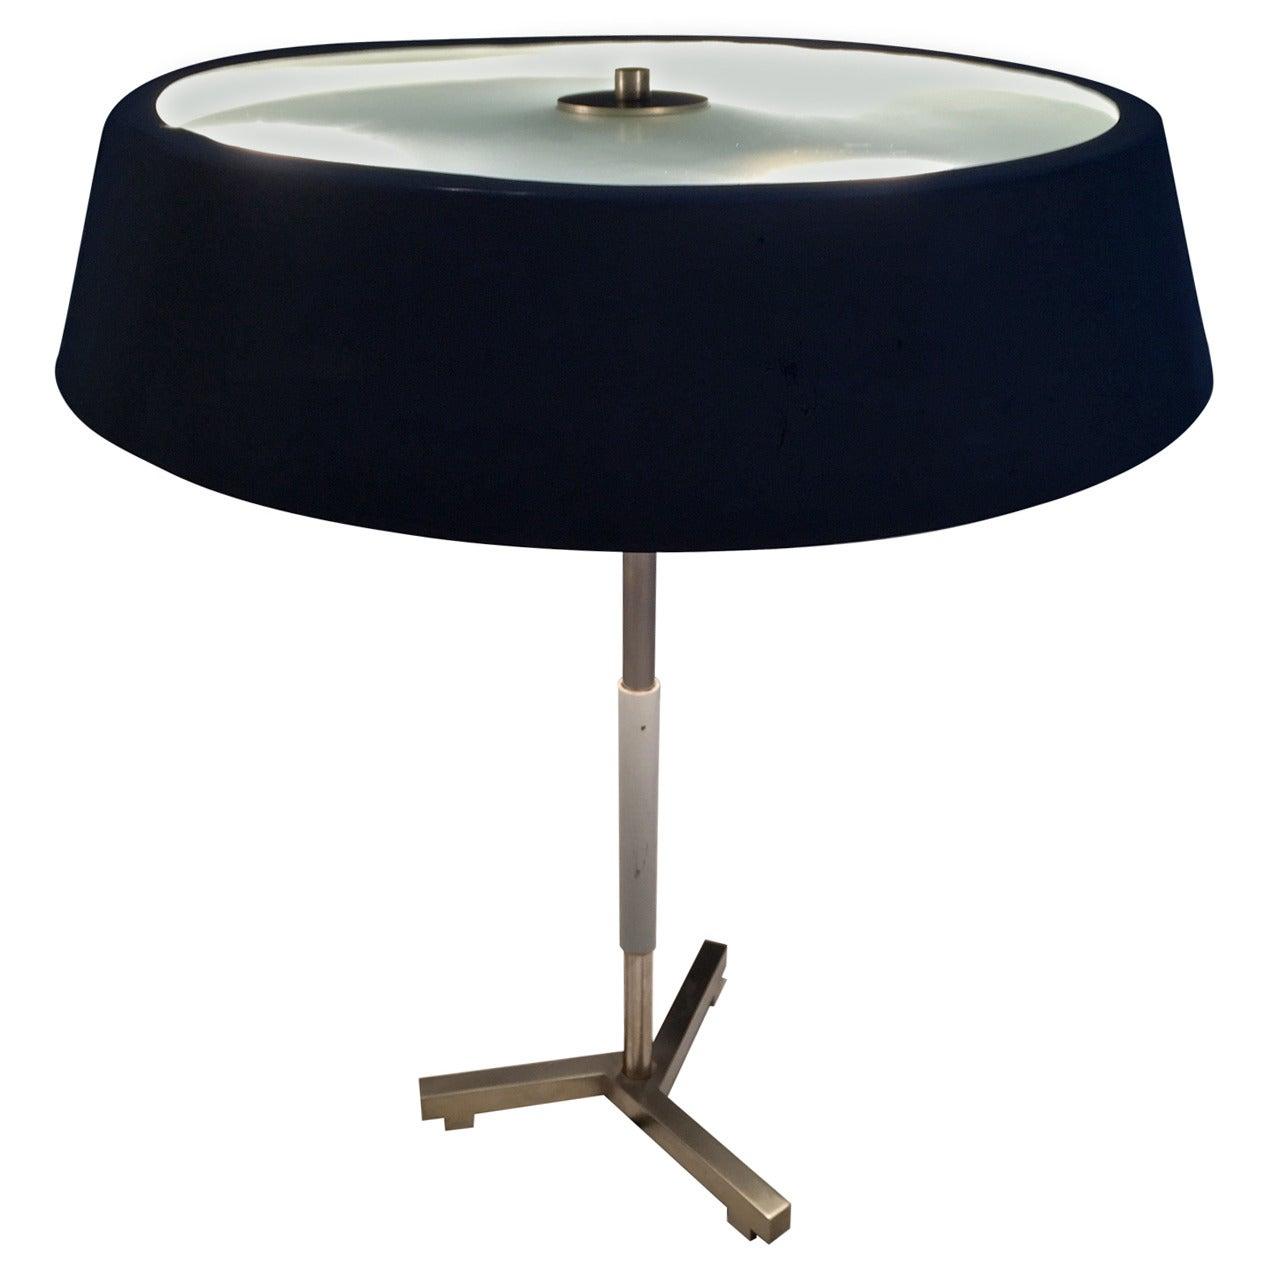 Rare table lamp by H. Fillekes for Artiforte, The Netherlands